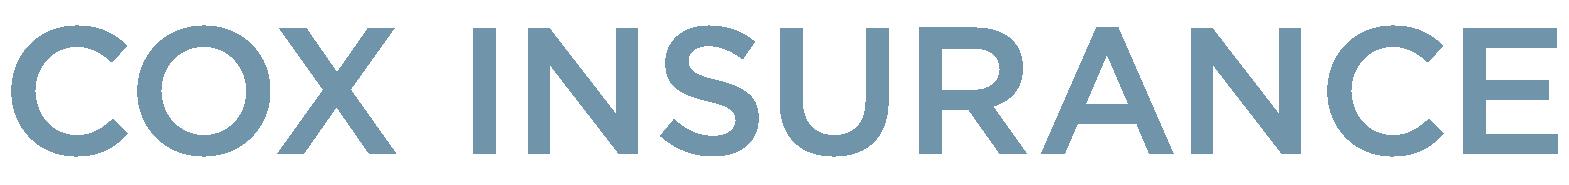 Cox Insurance Text Logo